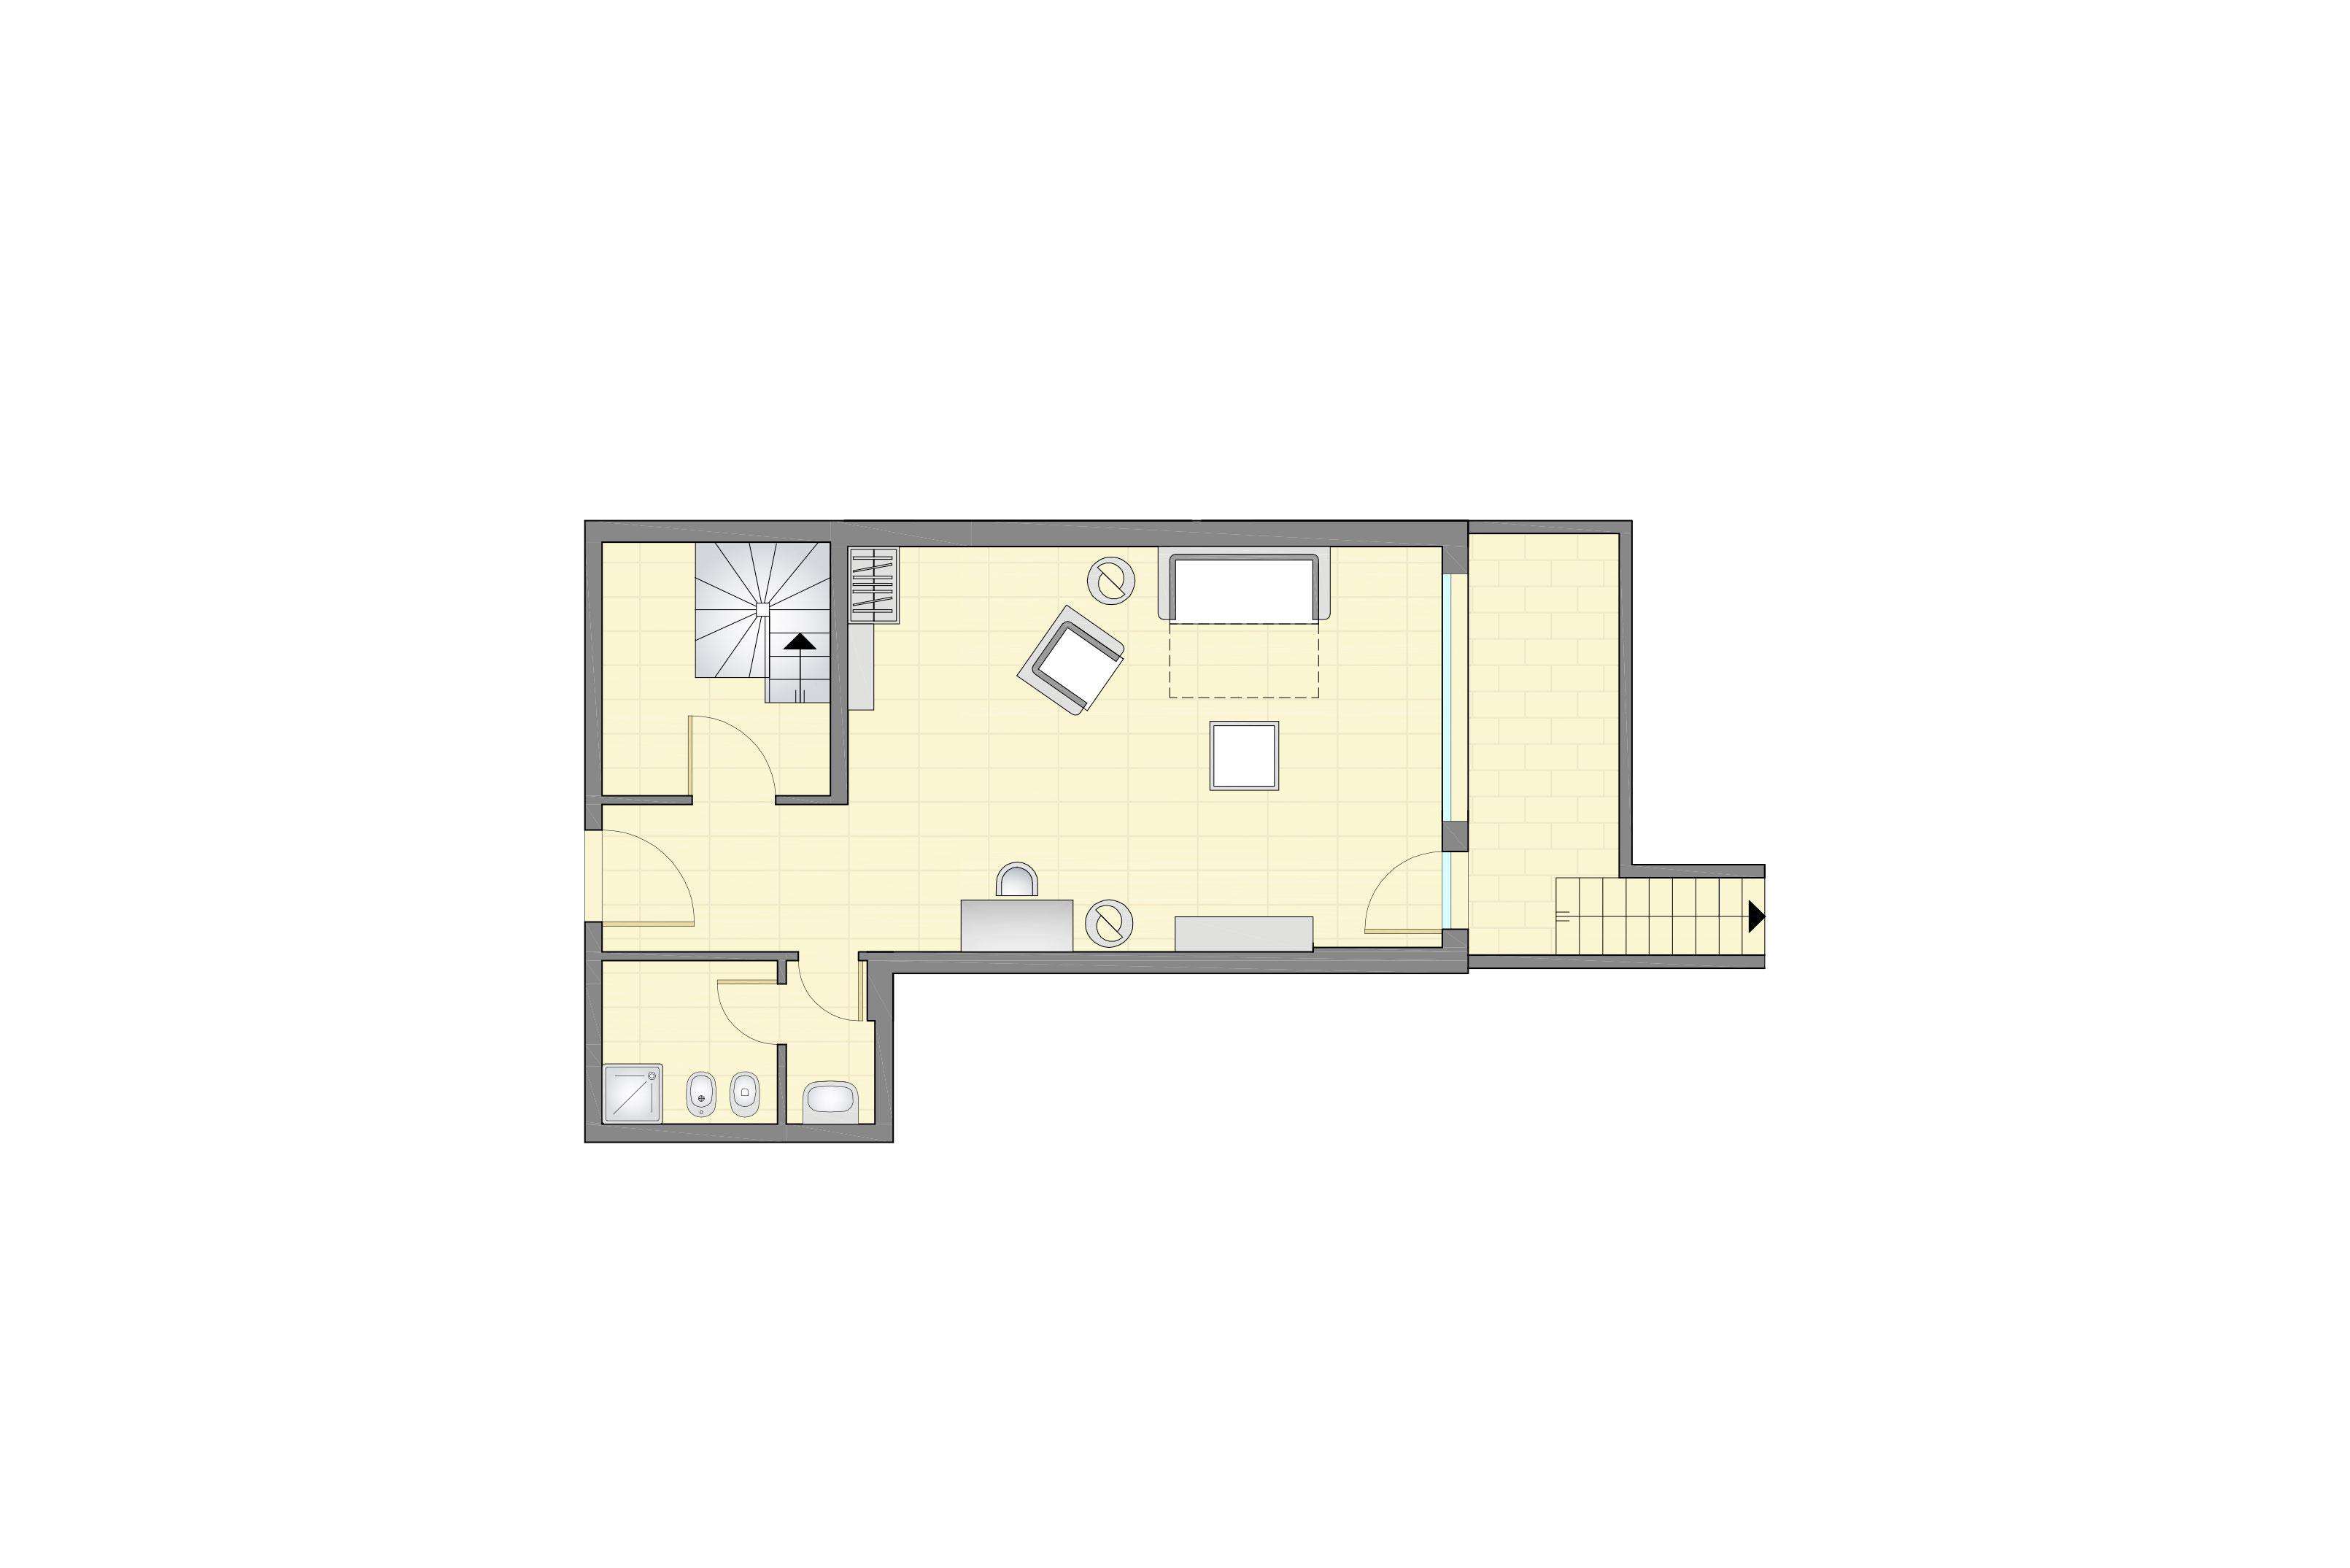 Planimetria appartamenti de luxe con giardino piano 2 for Planimetria giardino